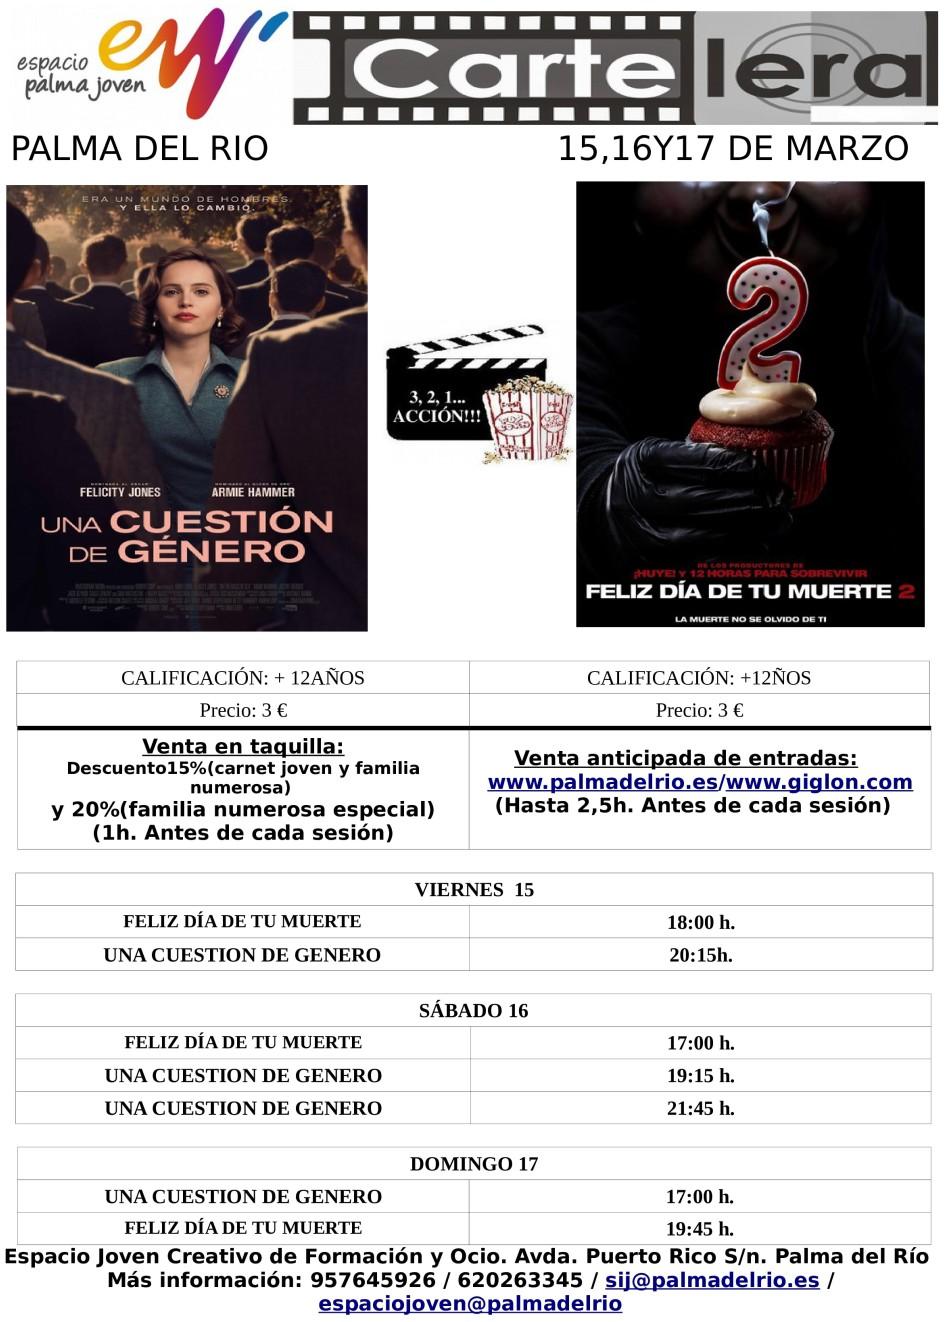 https://www.palmadelrio.es/sites/default/files/cine_15.16.17_marzo_2019.jpg